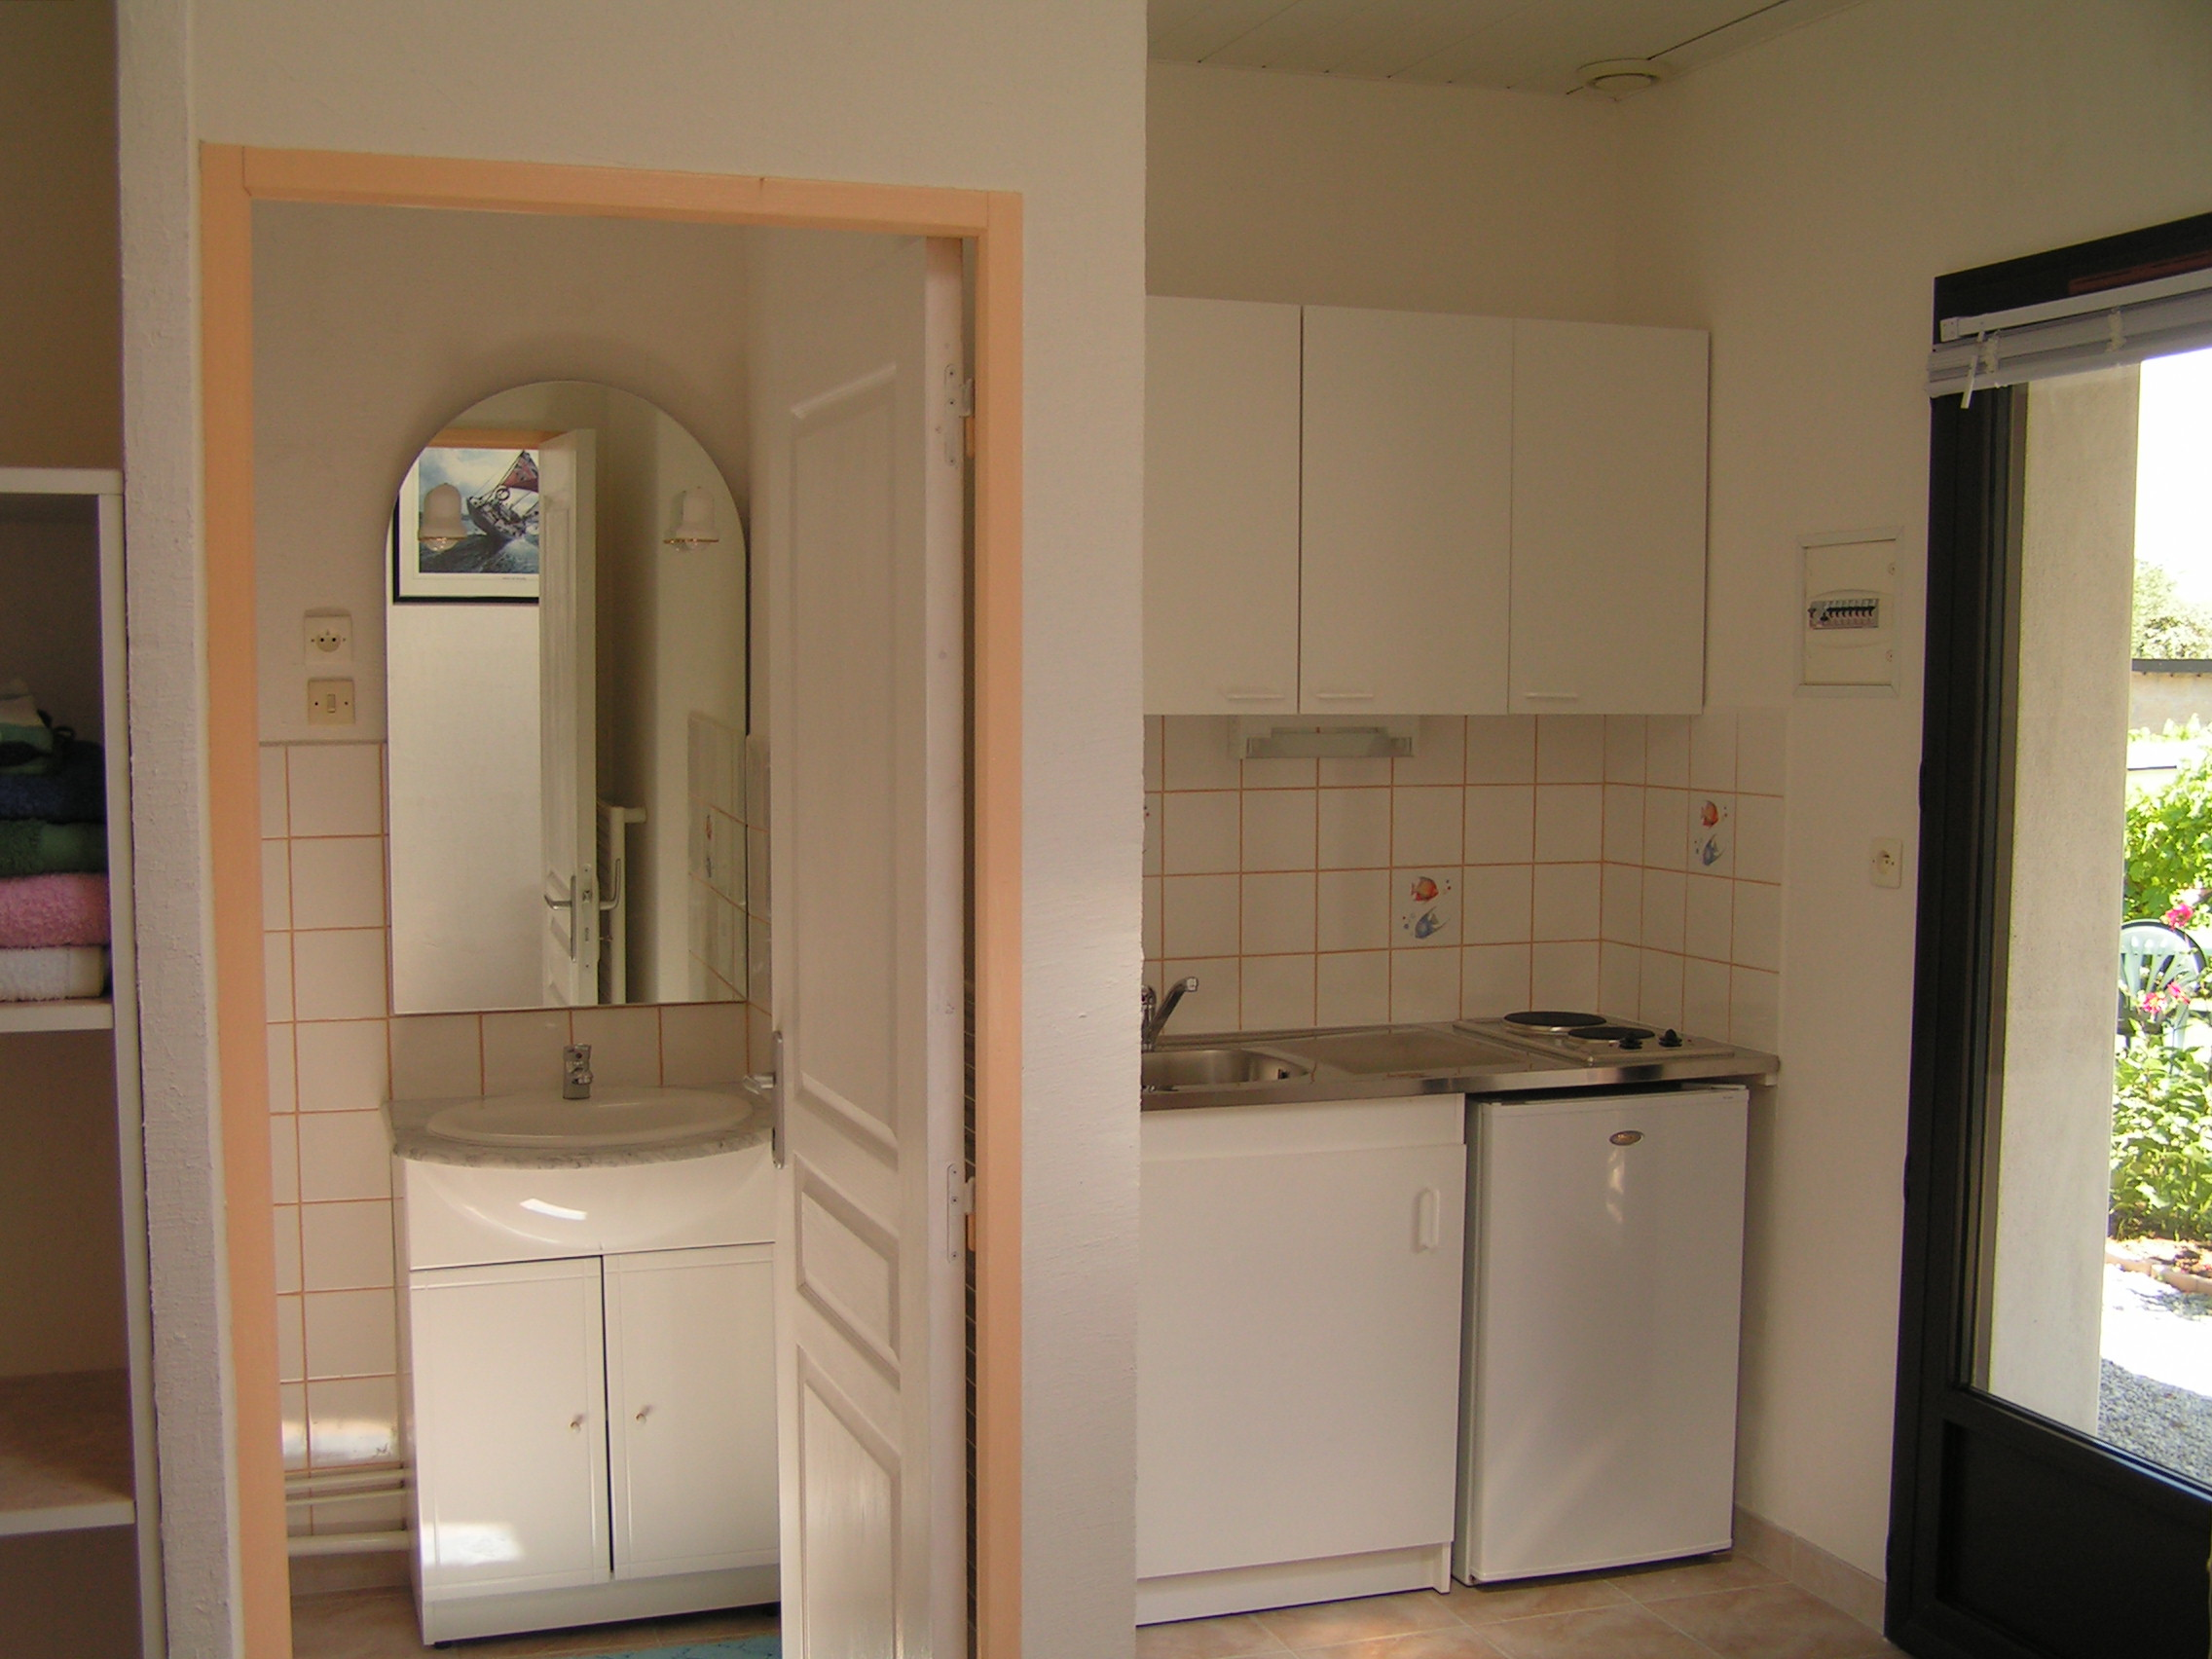 Location tudiant location tudiant vannes studio for Location meuble vannes